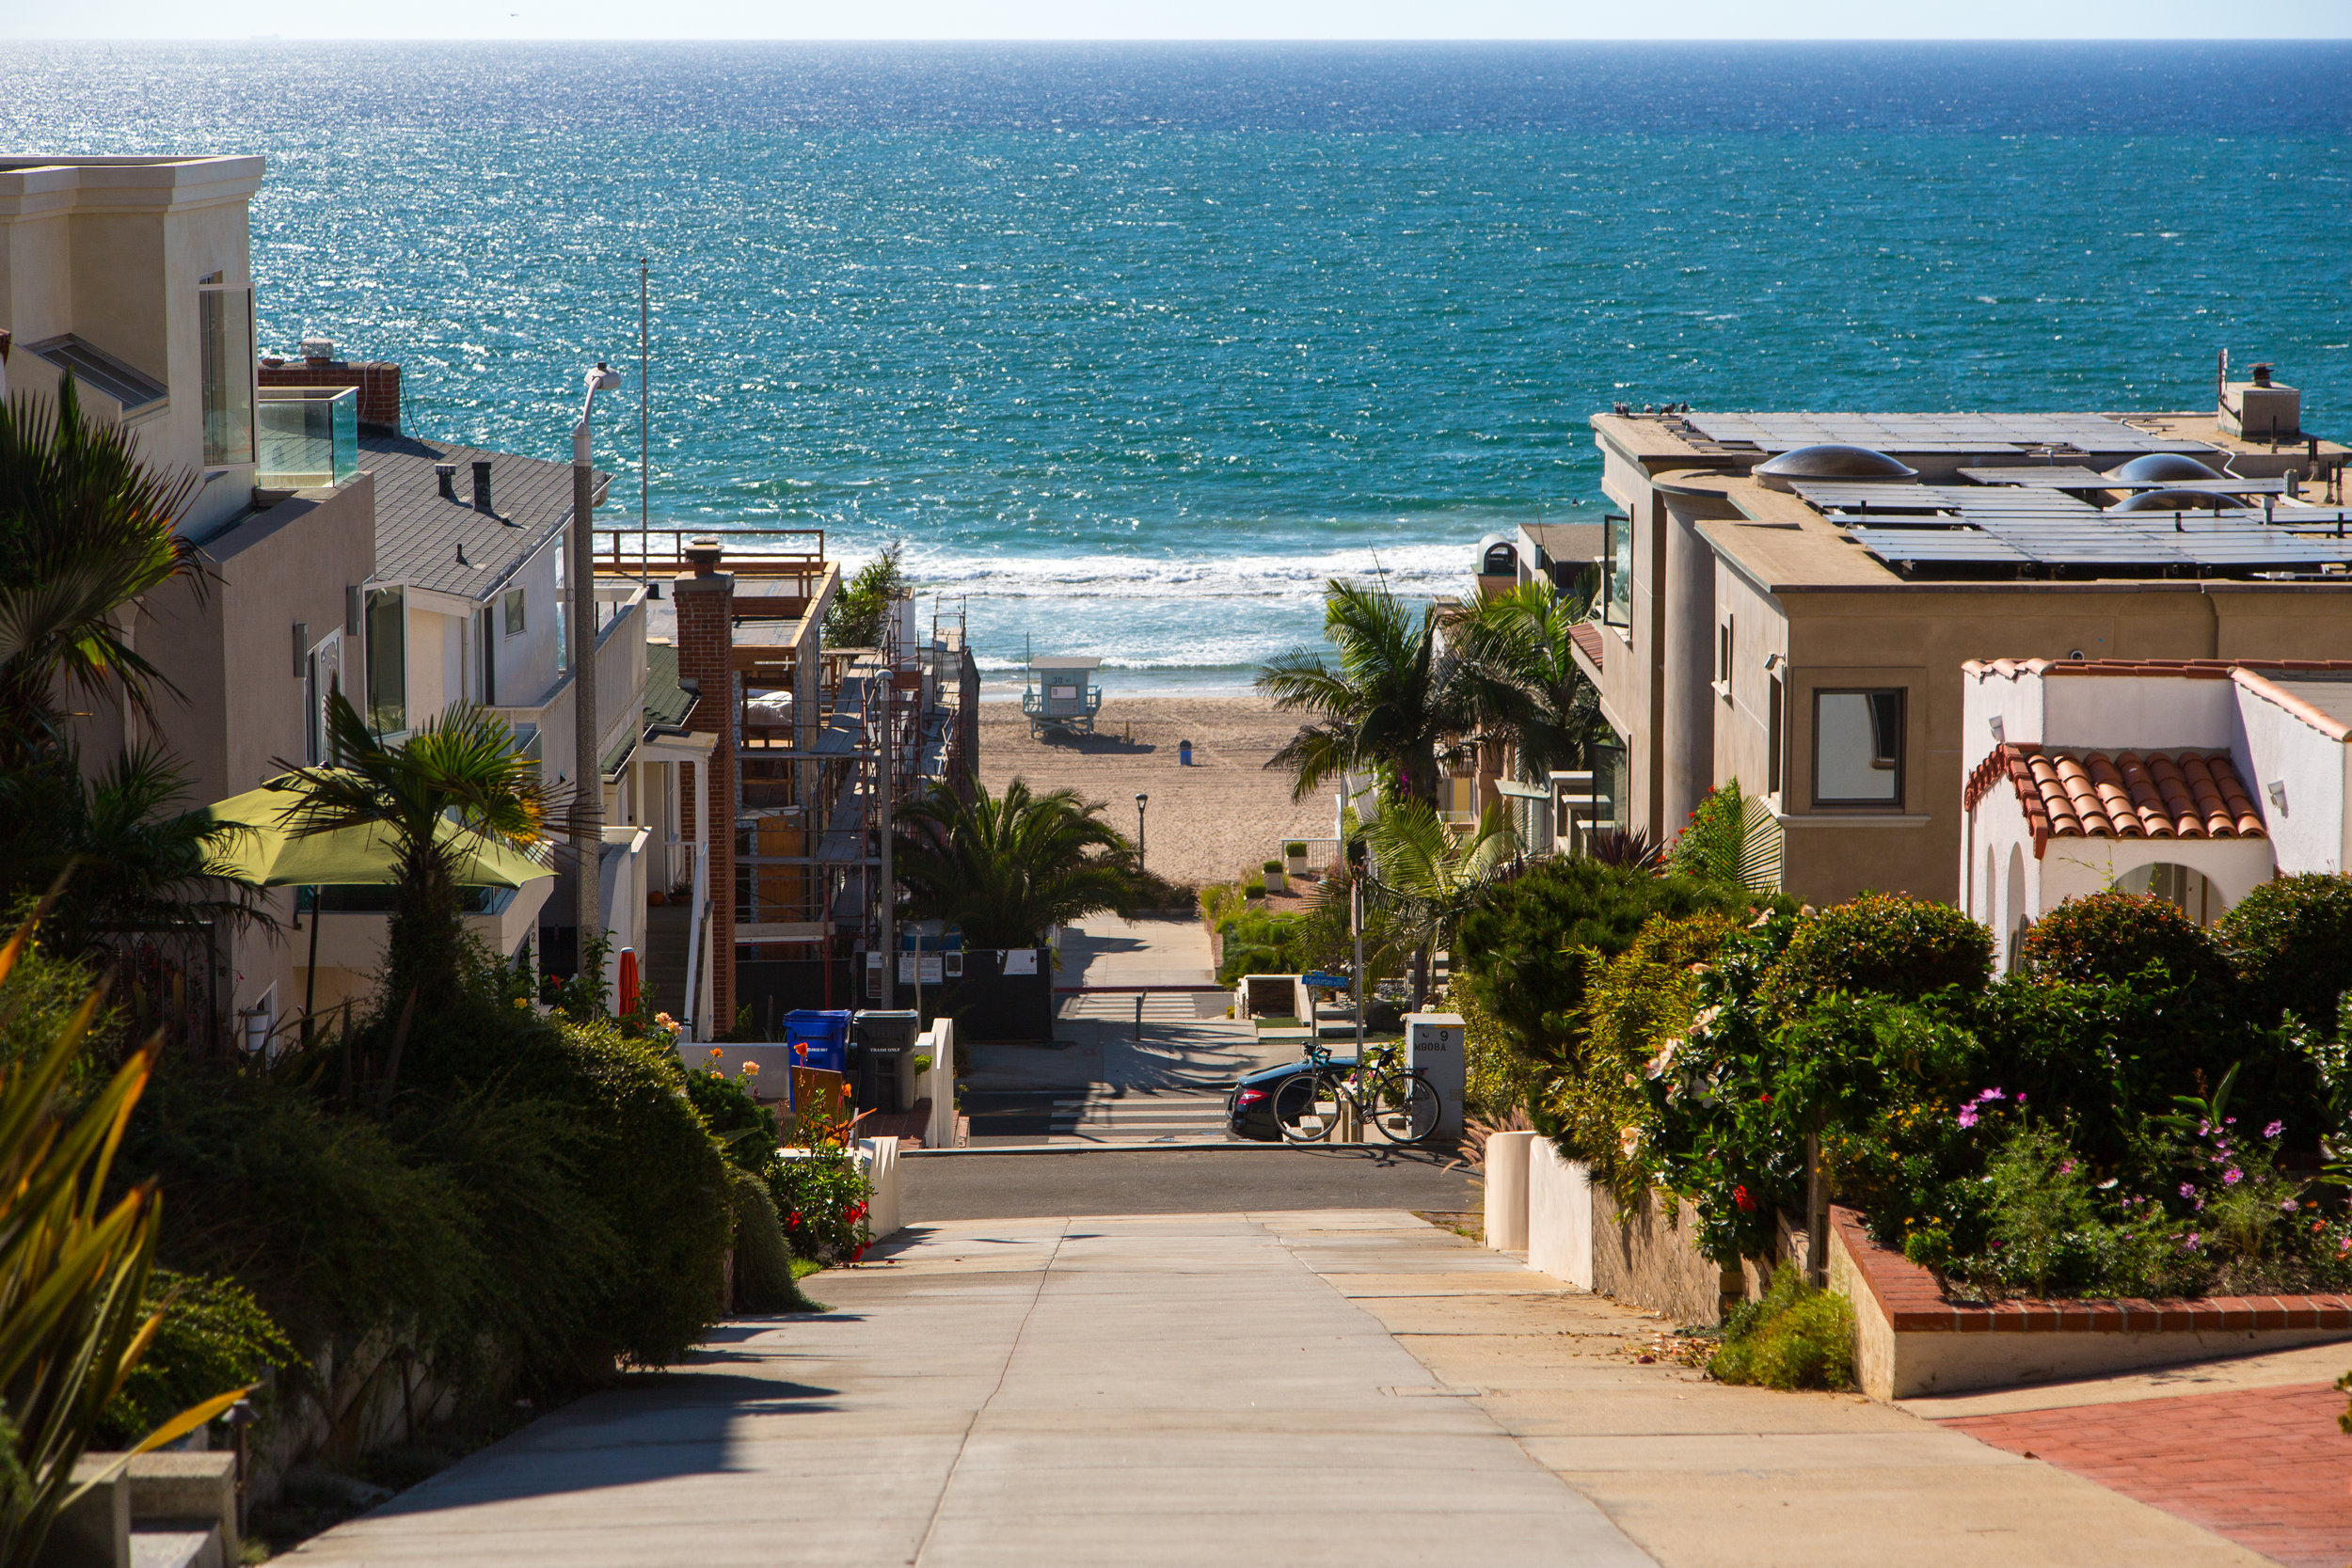 Manhattan Beach - Neighborhood Street to Beach (Signature).jpg